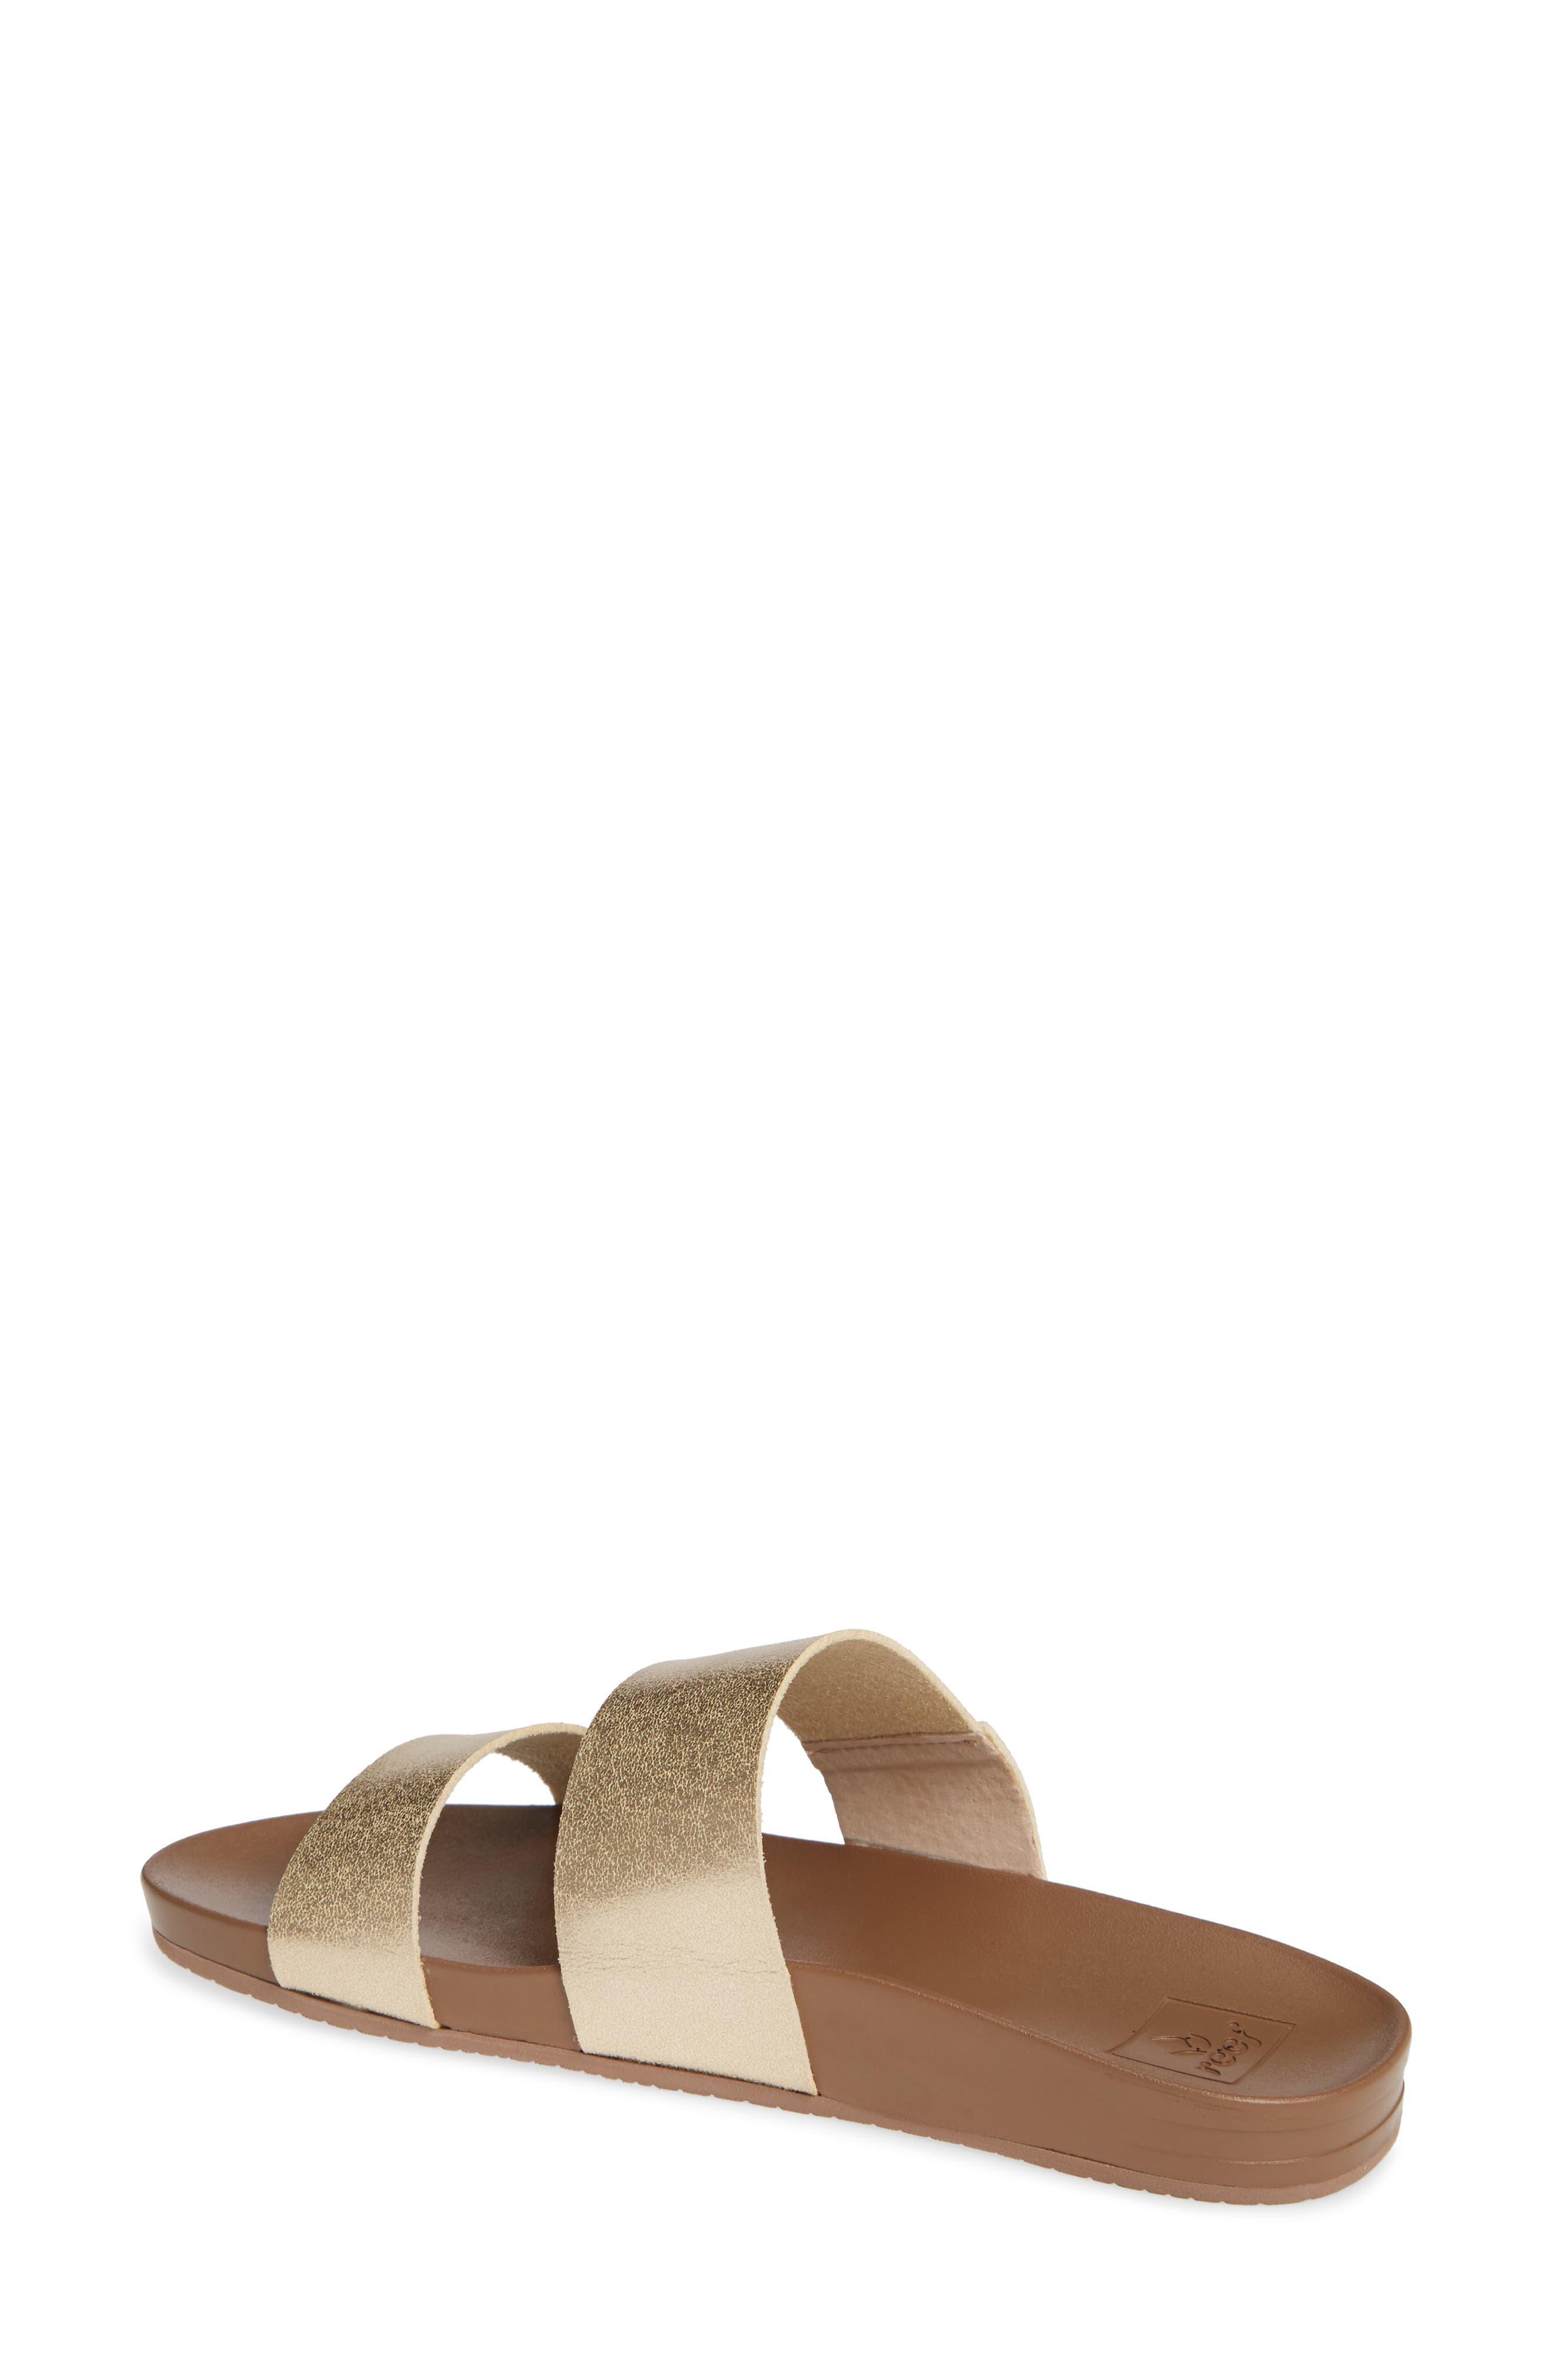 REEF,                             Cushion Bounce Vista Slide Sandal,                             Alternate thumbnail 2, color,                             710